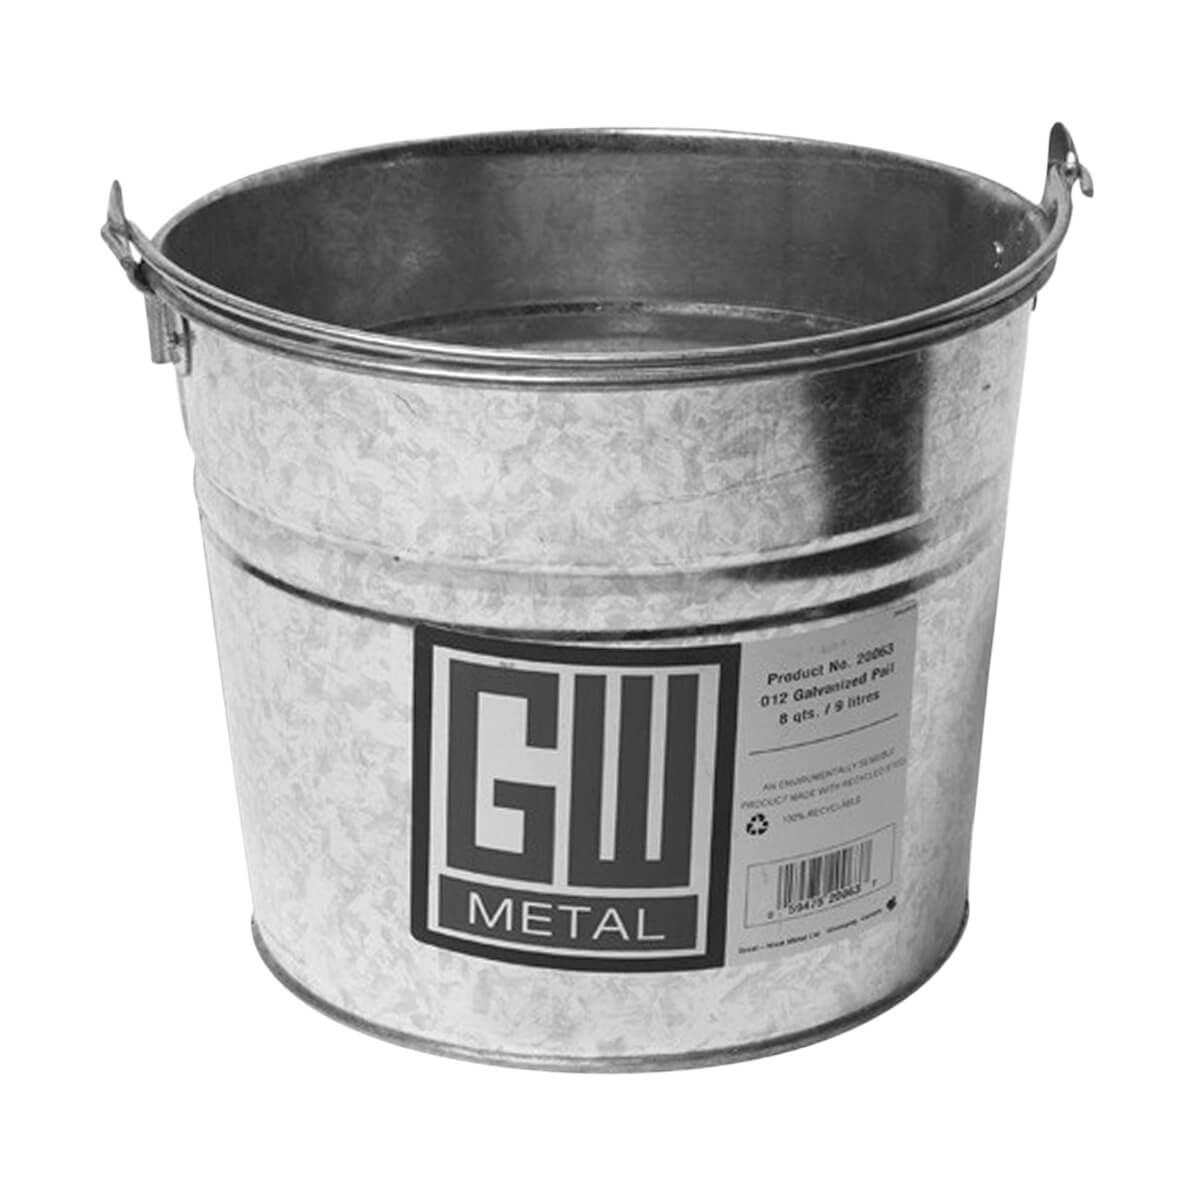 GW Metal Galvanized Pail - 8 qt